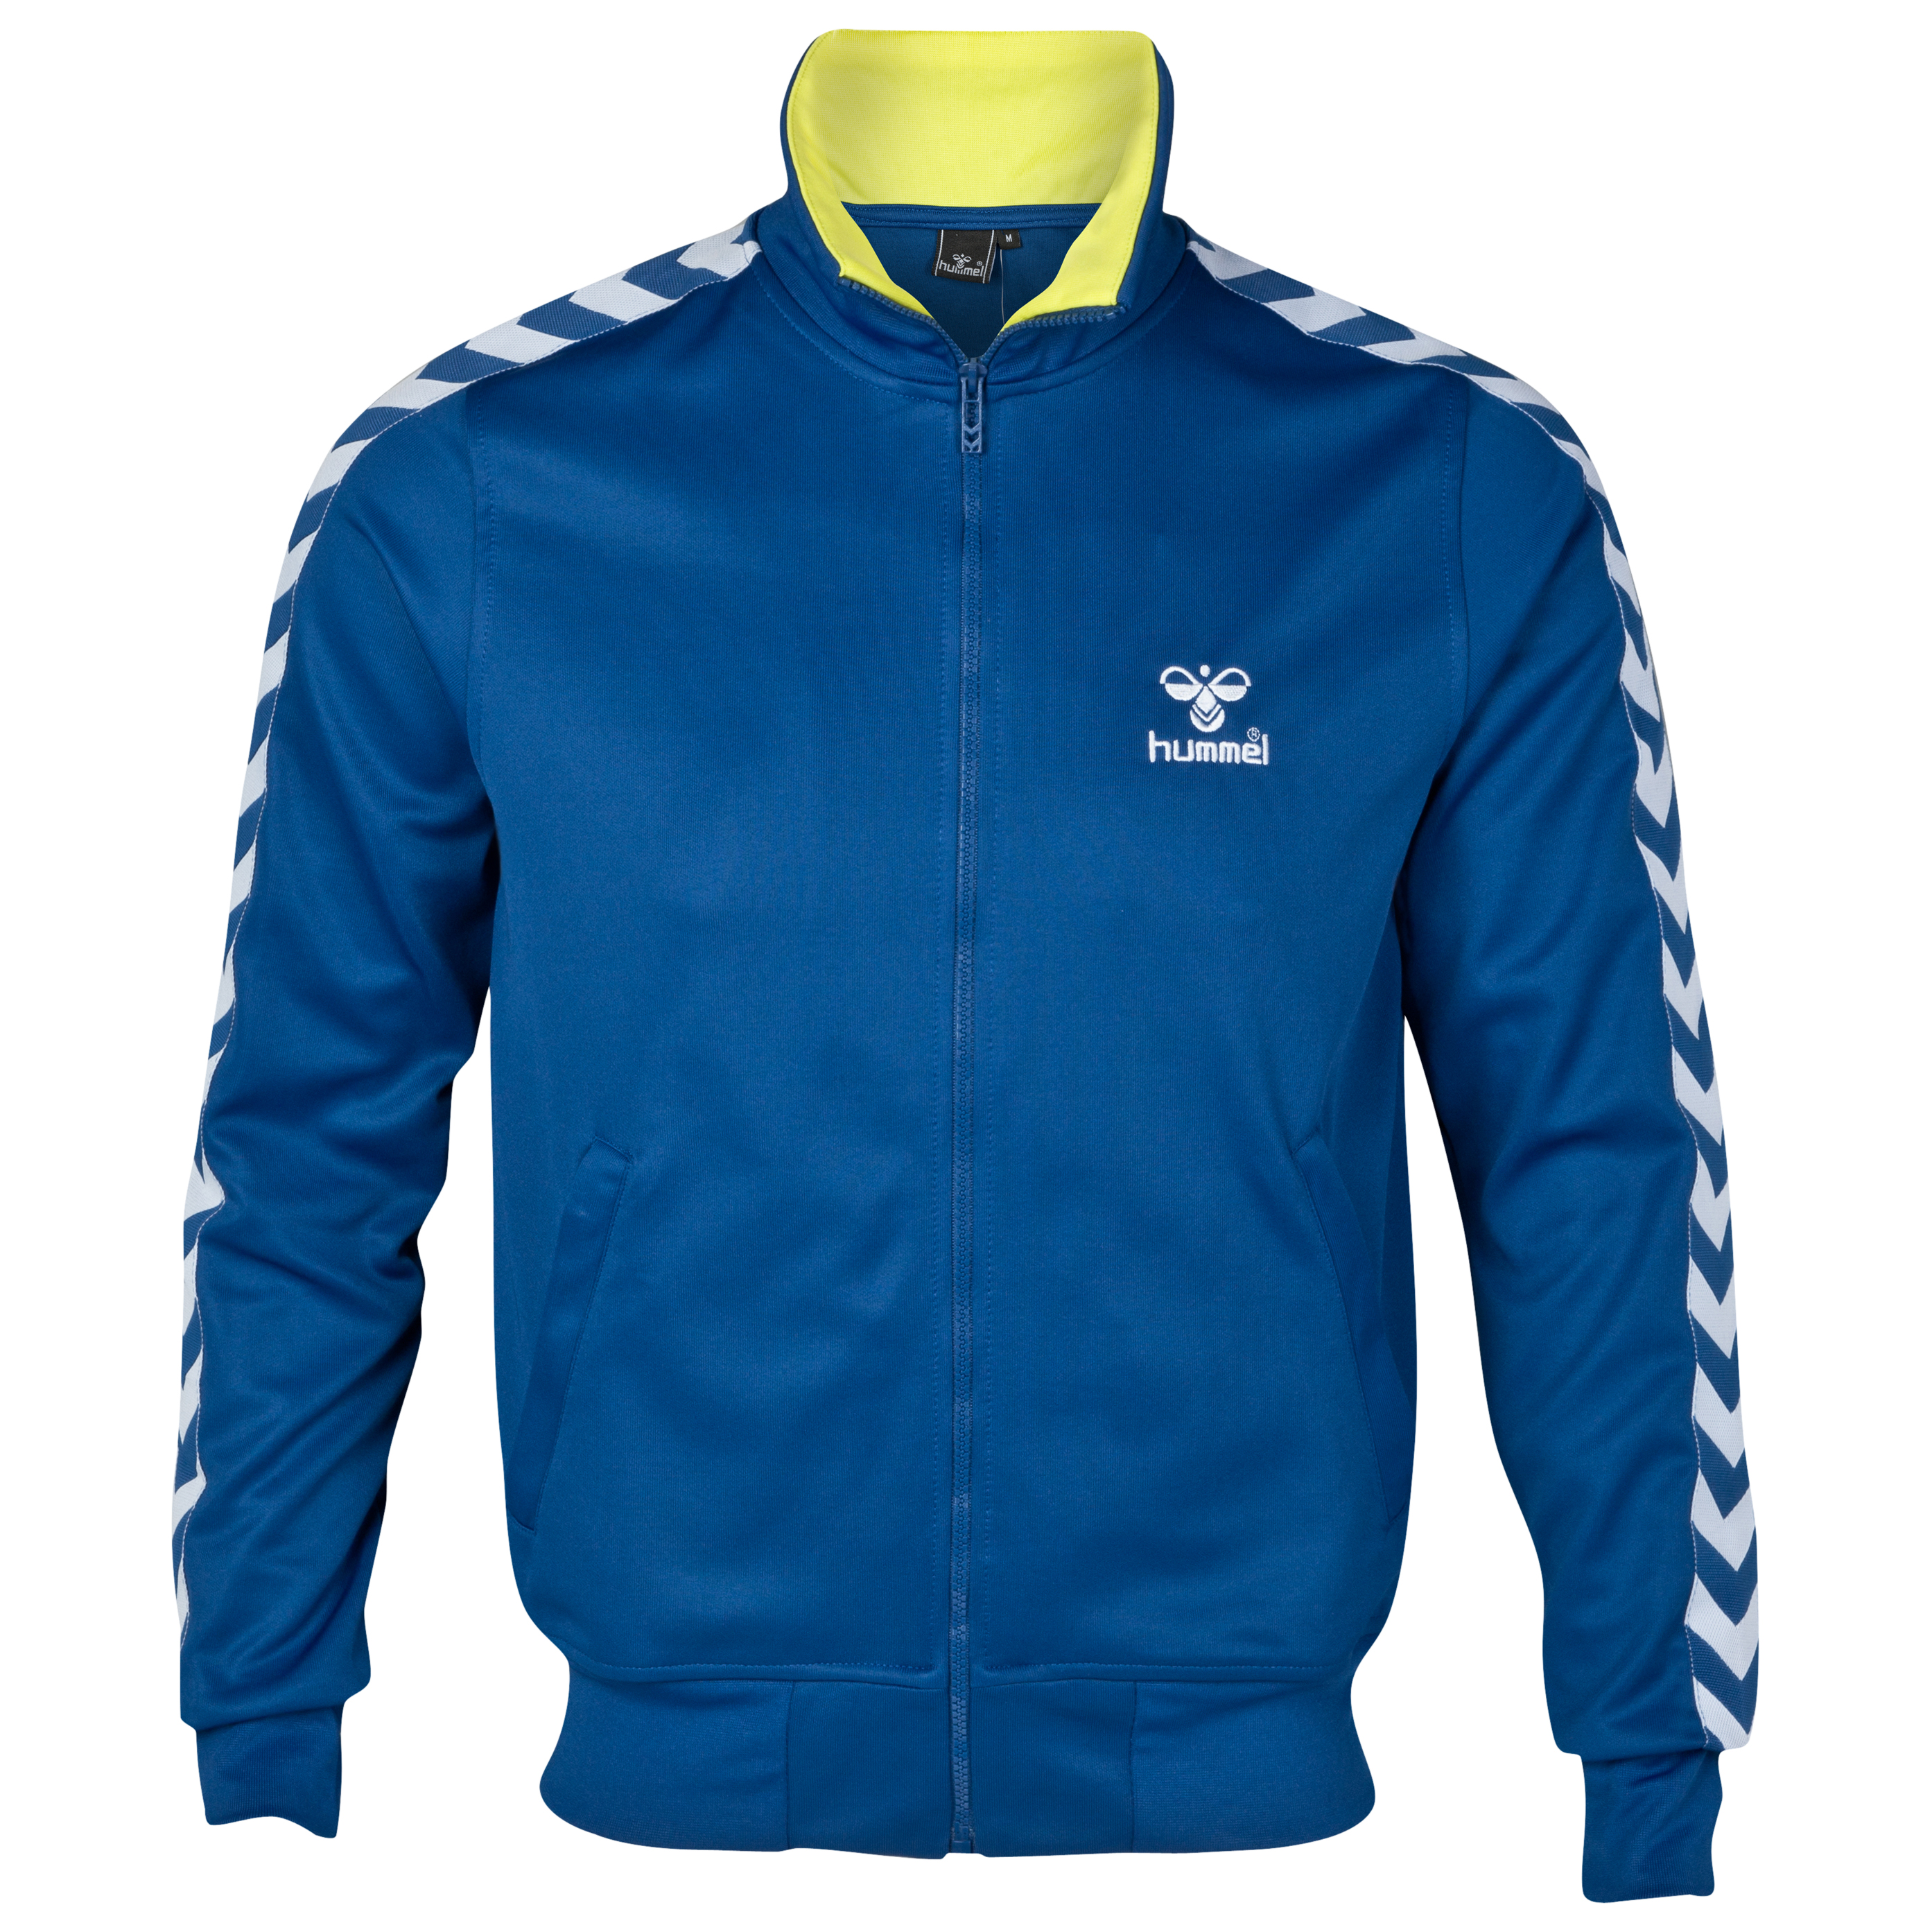 Hummel Atlantic Zip Track Jacket - Limoges